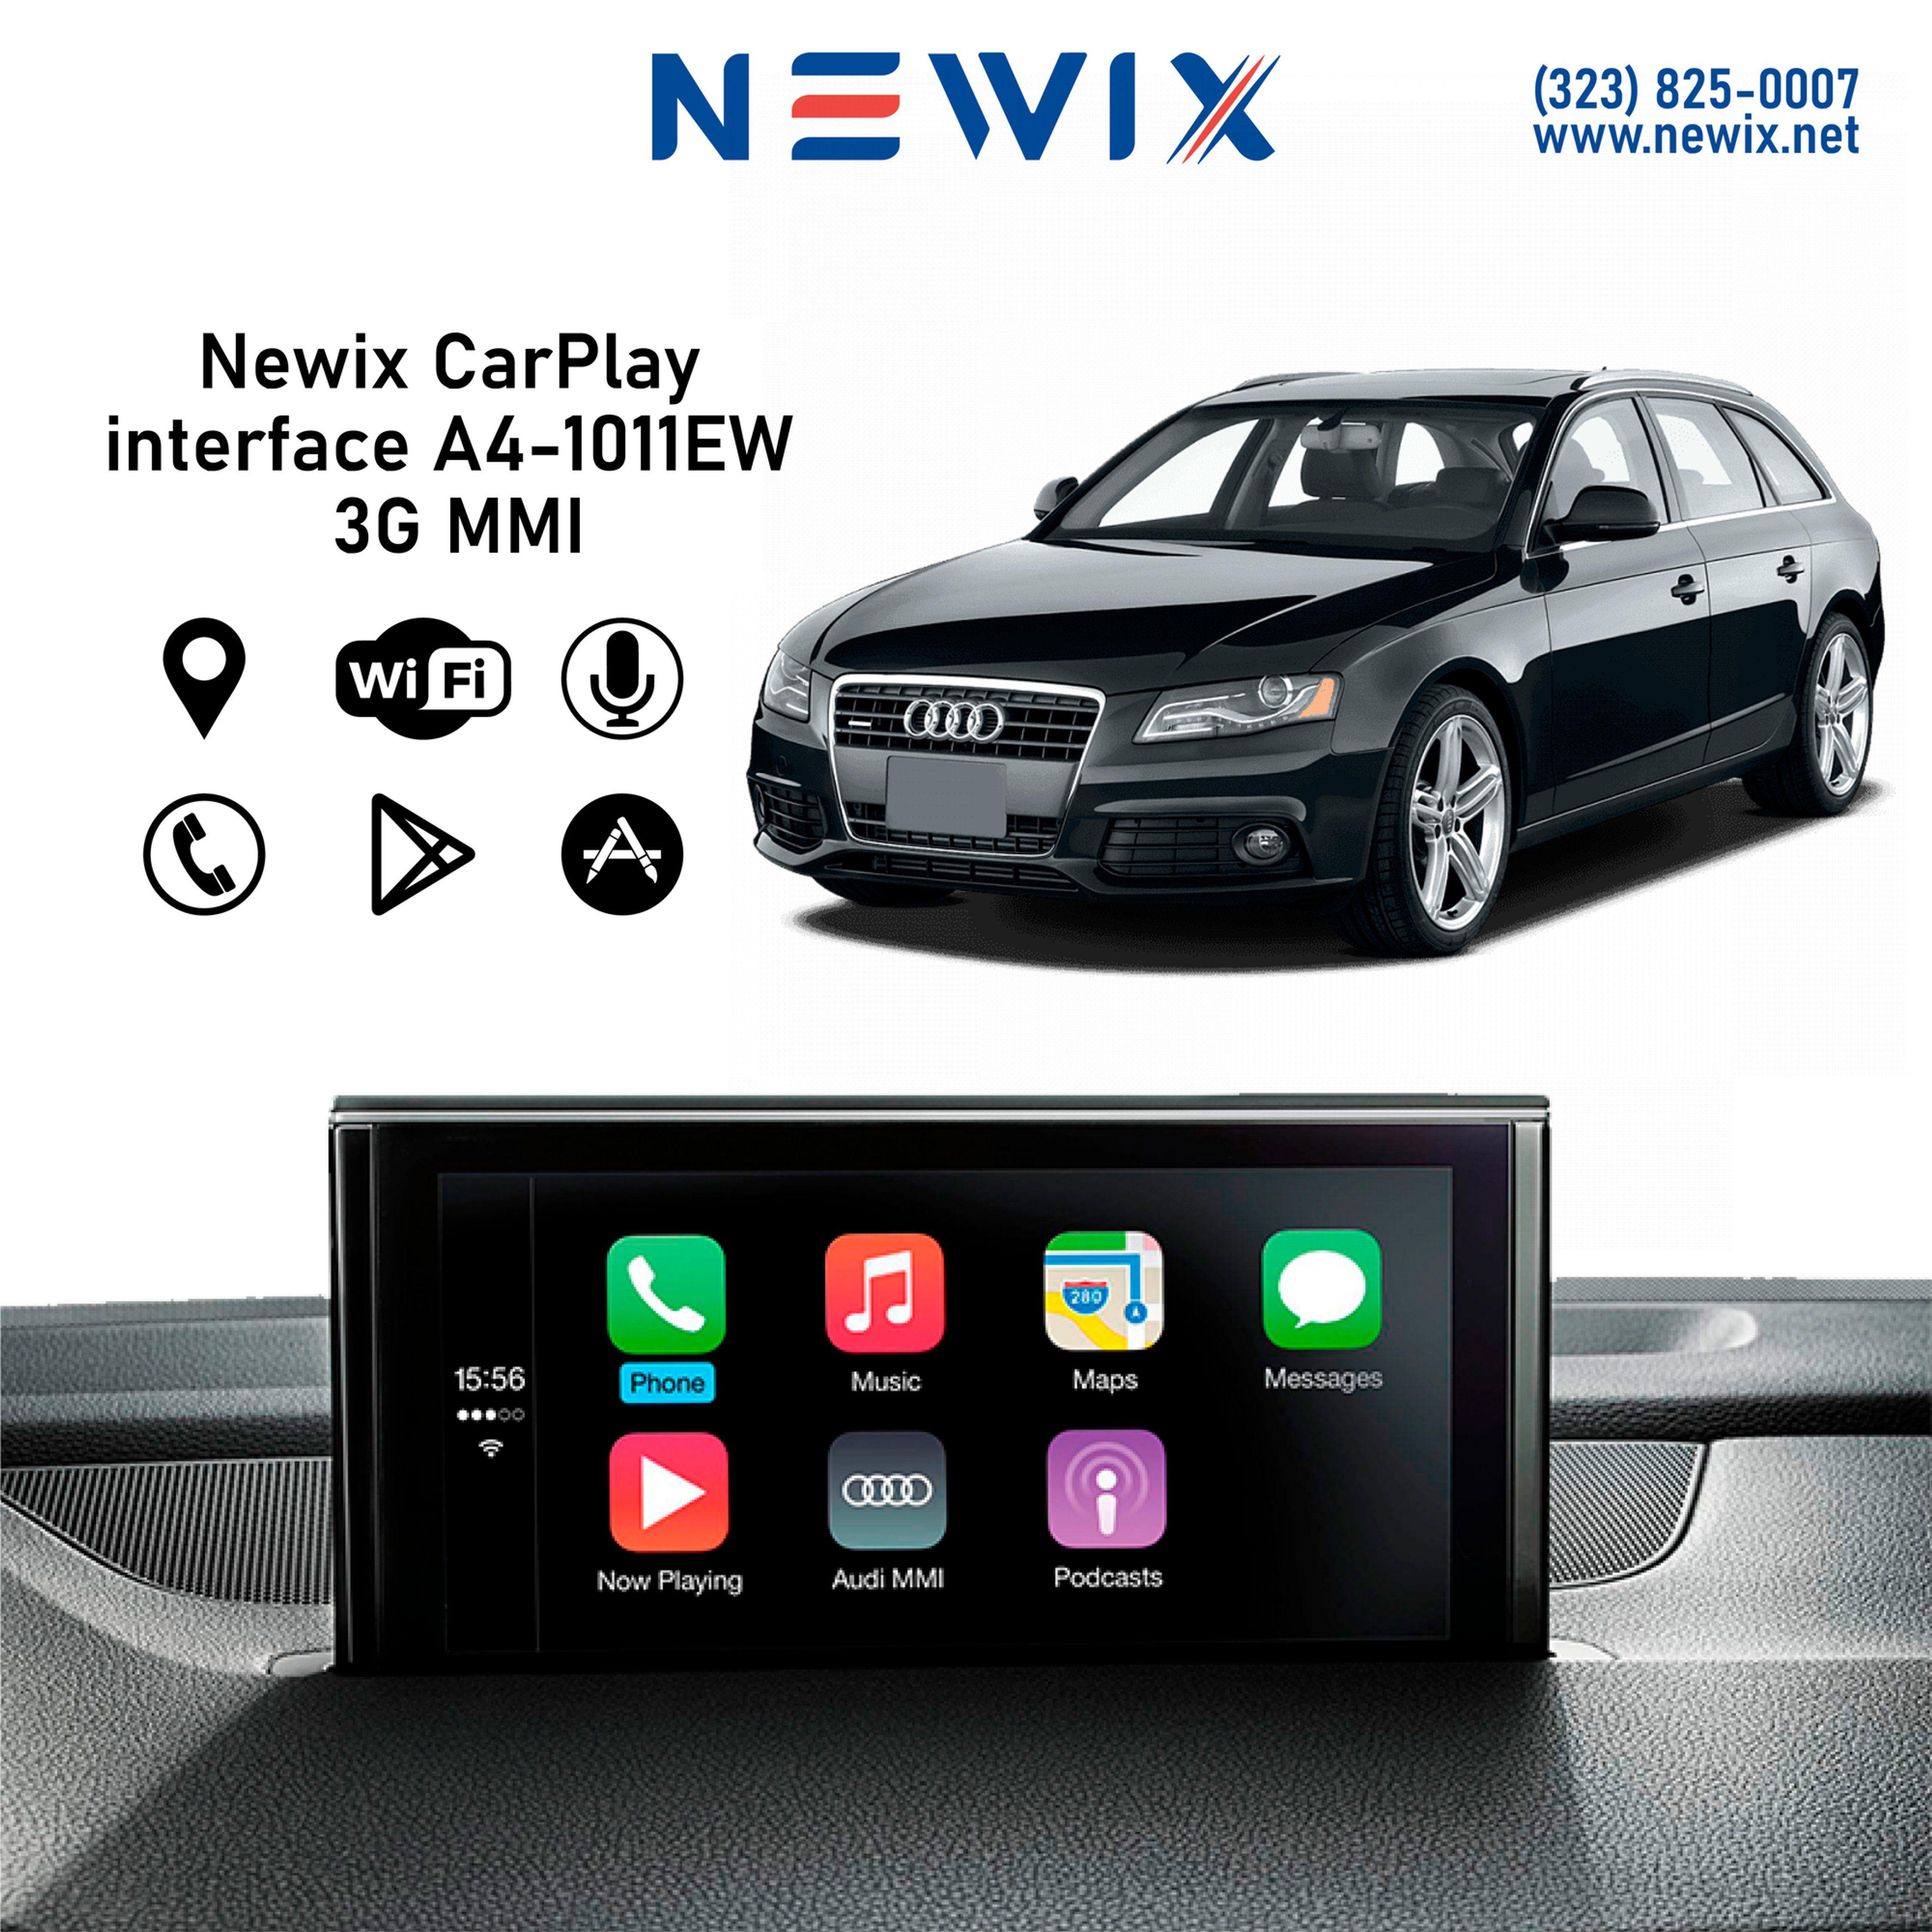 Newix Carplay Interface For Audi A4 3g Mmi 2010 2011 Carplay Audi Audi A3